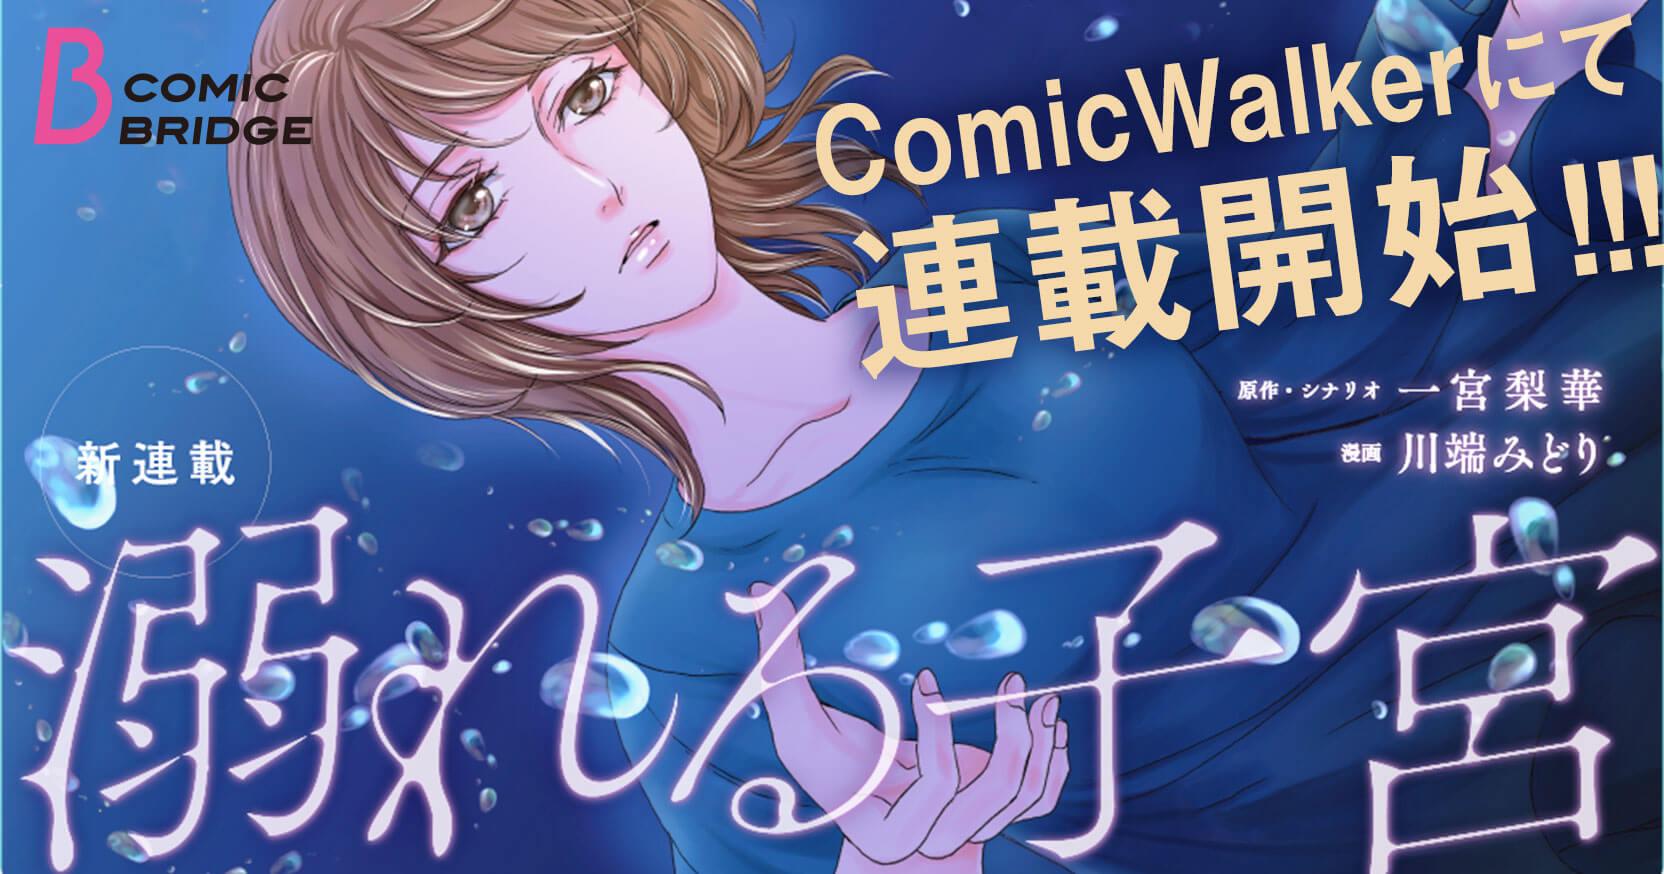 https://storage.googleapis.com/blog-info/entry/2021/09/210929-comic-oboreru_ogp.jpg